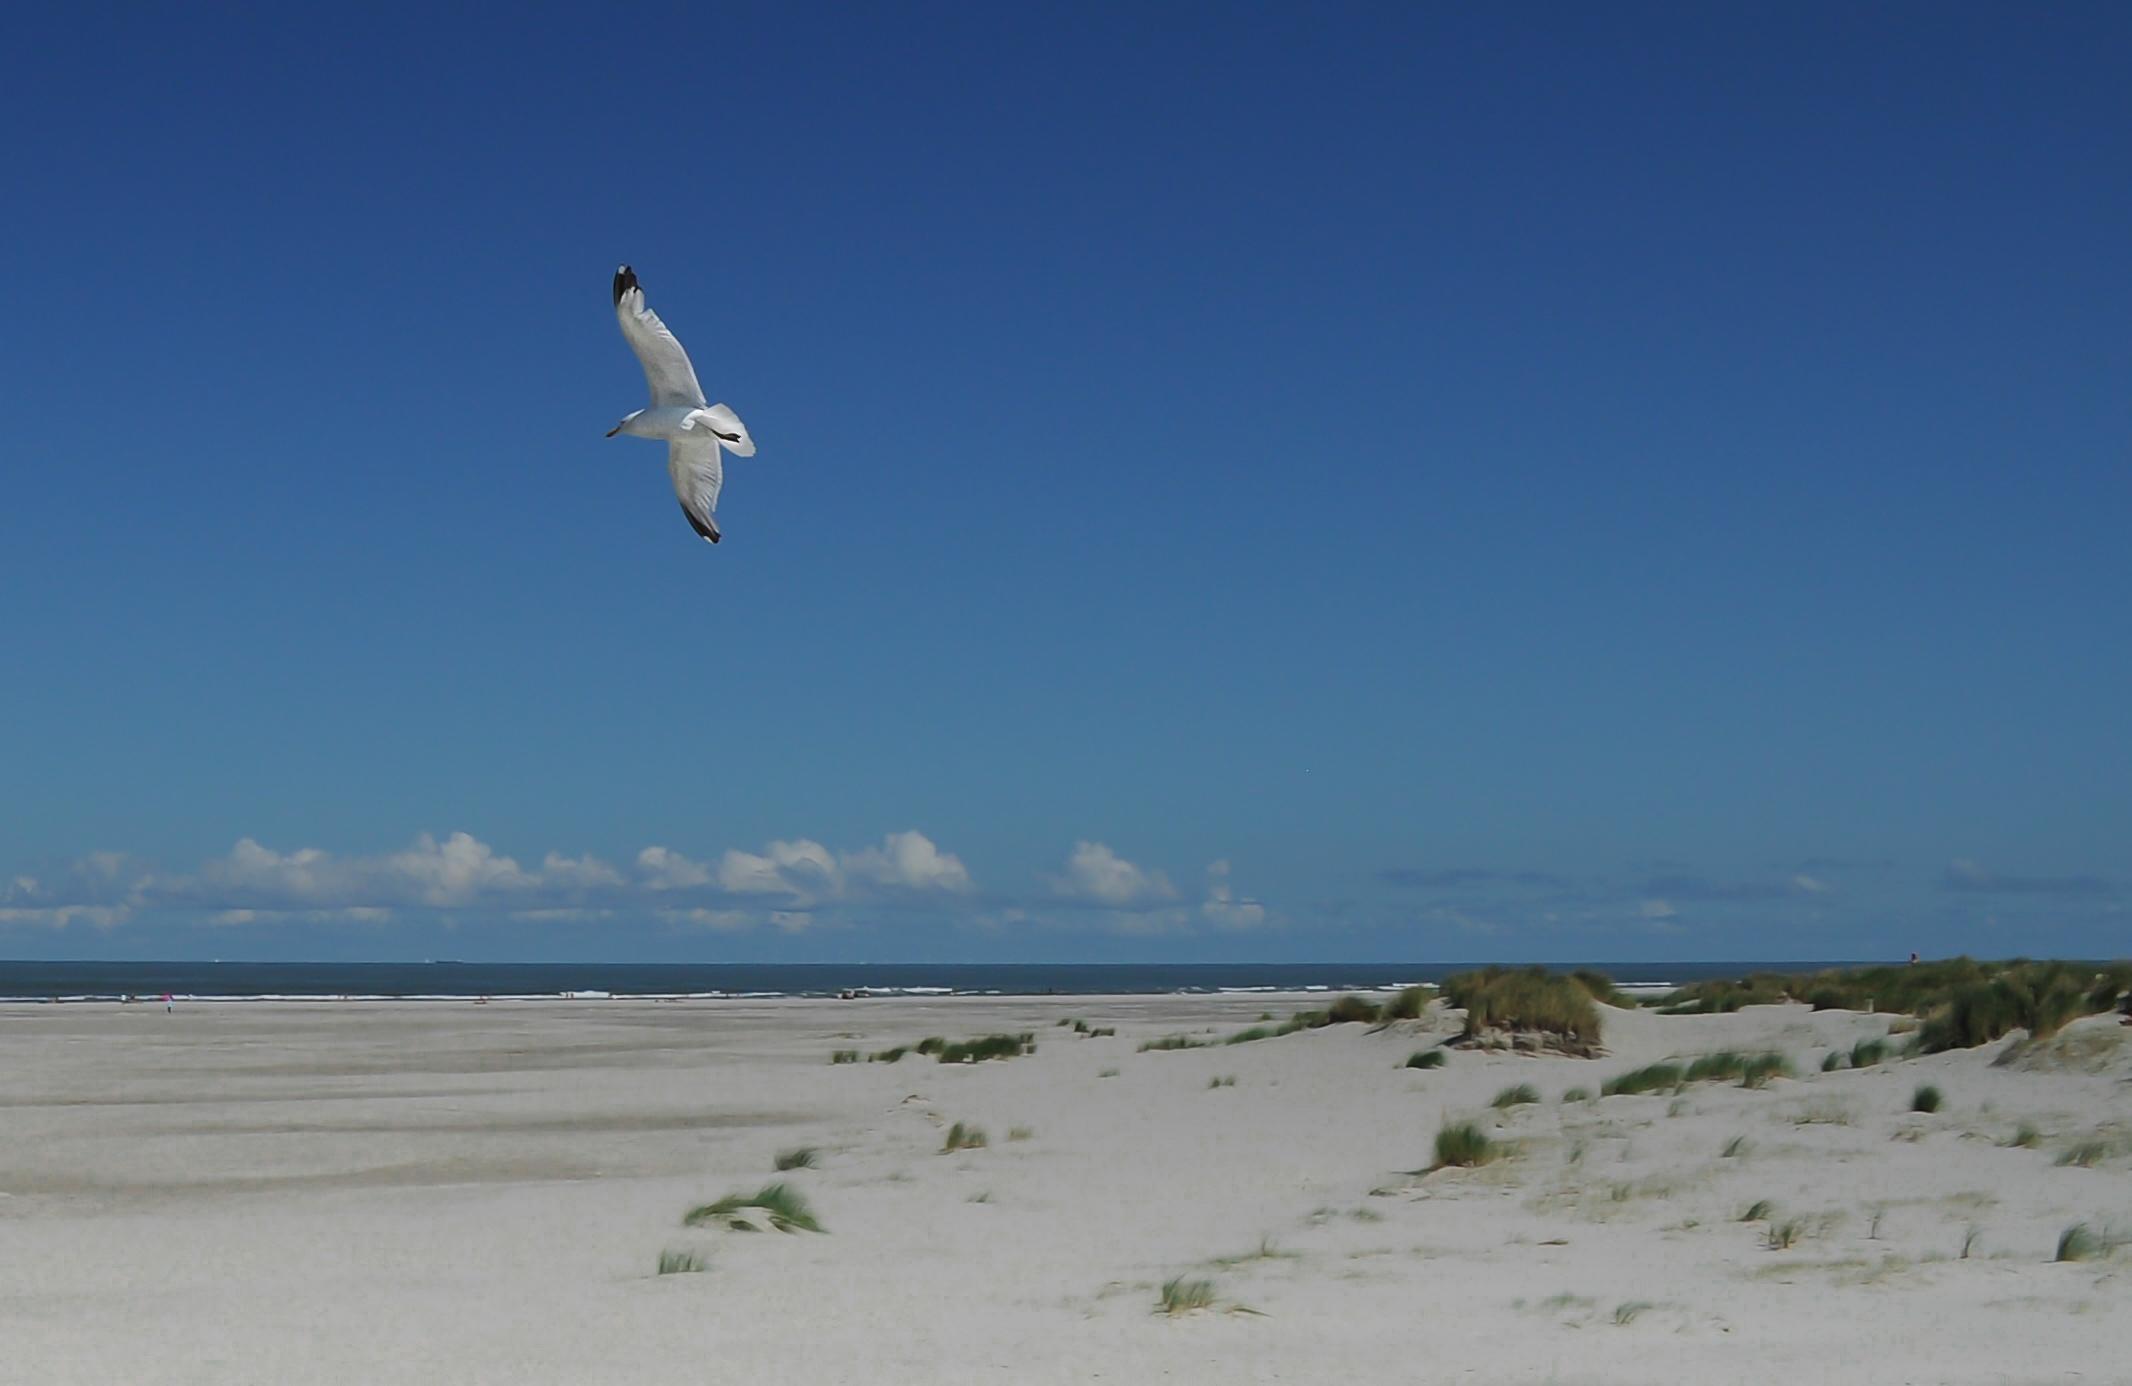 Windows 8 1 Wallpaper Hd Free Download Free Stock Photo Of Beach Bird Flying